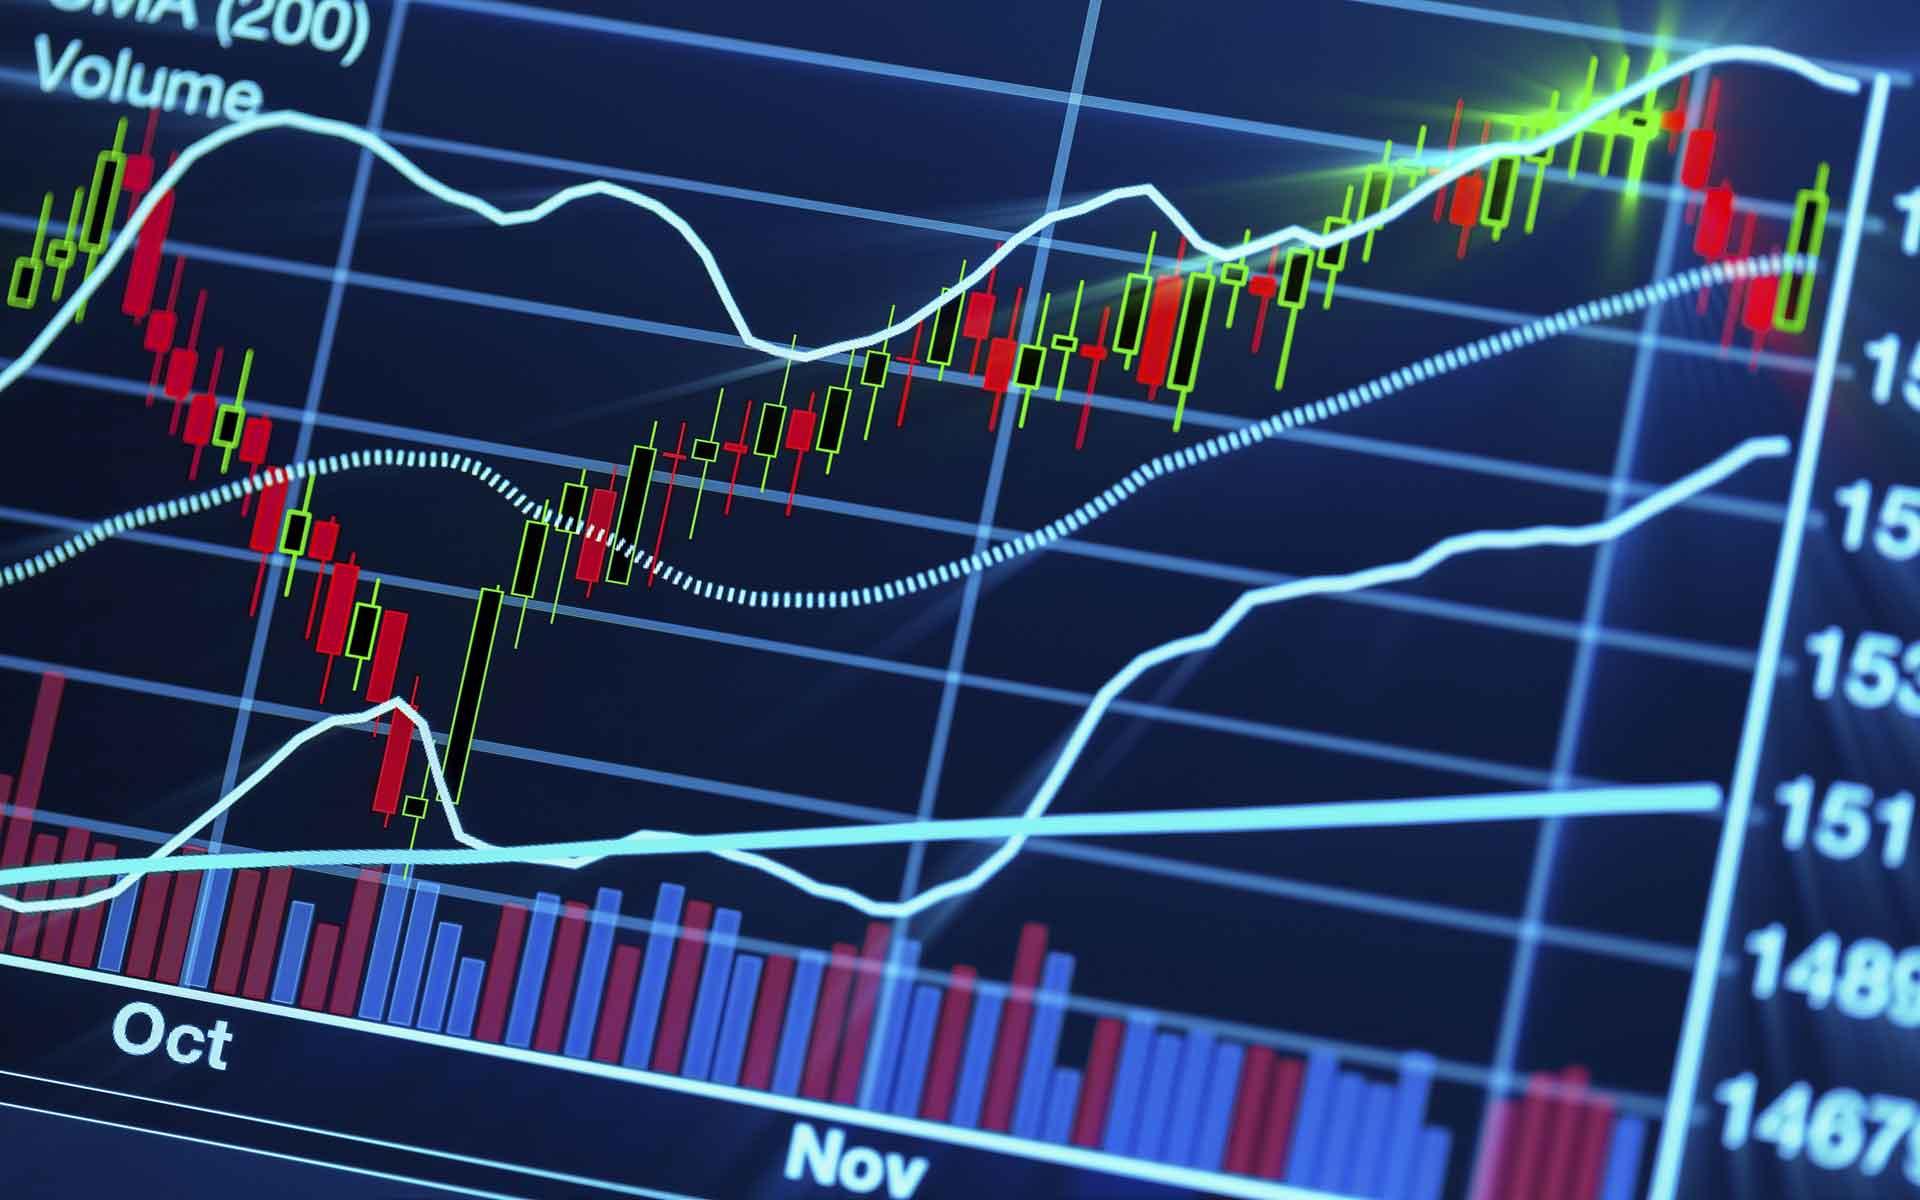 Top-10-cau-noi-cua-Paul-Tudor-Jones-ve-Price-Action-trading-TraderViet2.